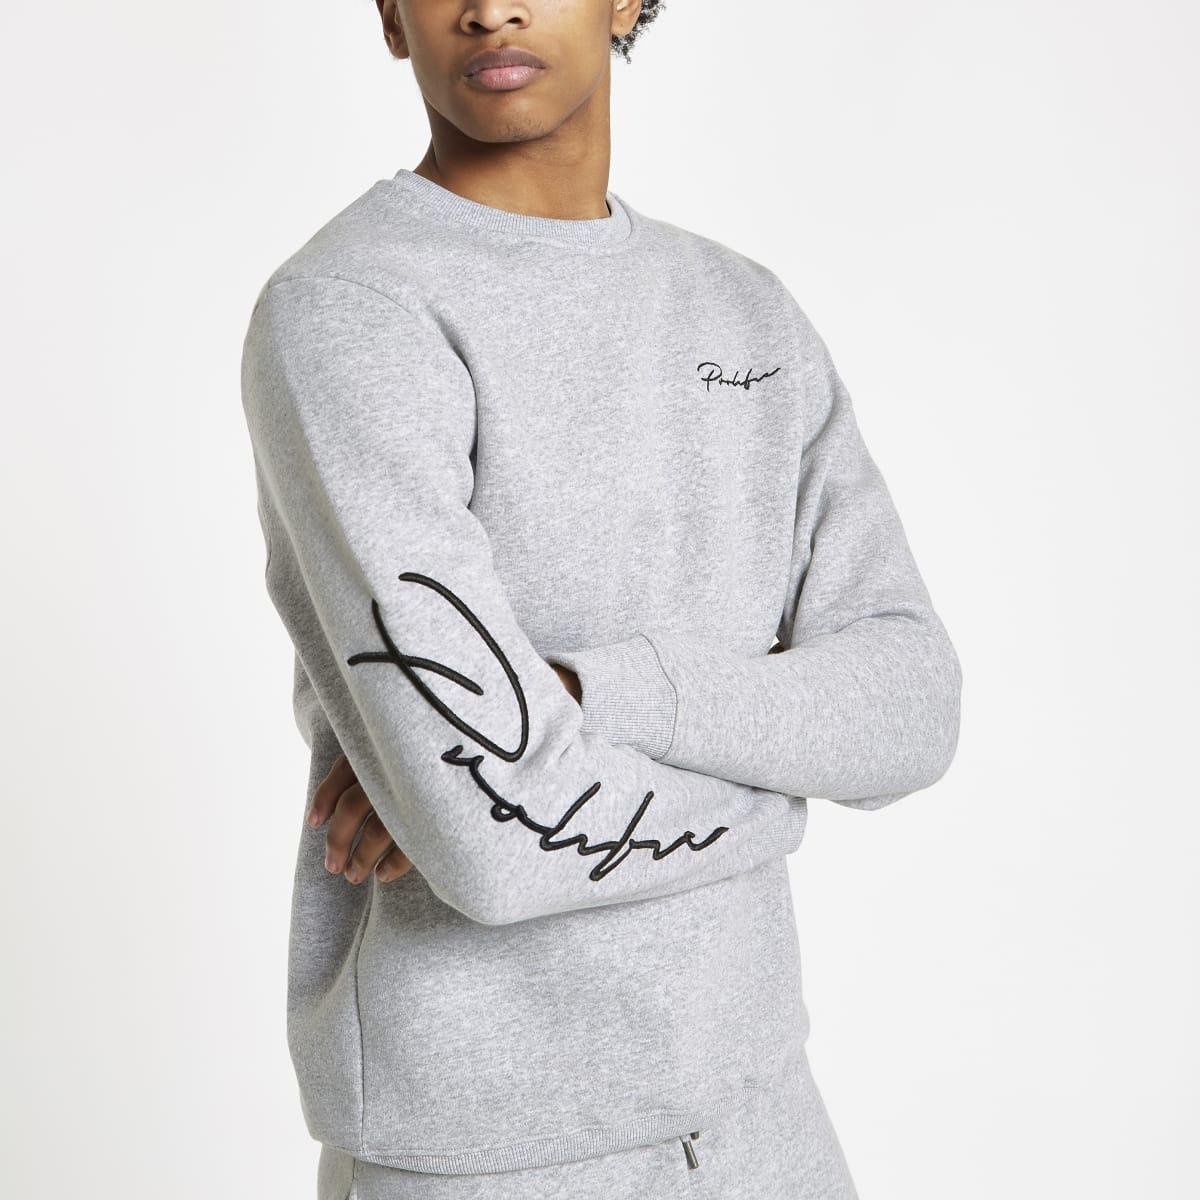 Grey marl 'Prolific' slim fit sweatshirt